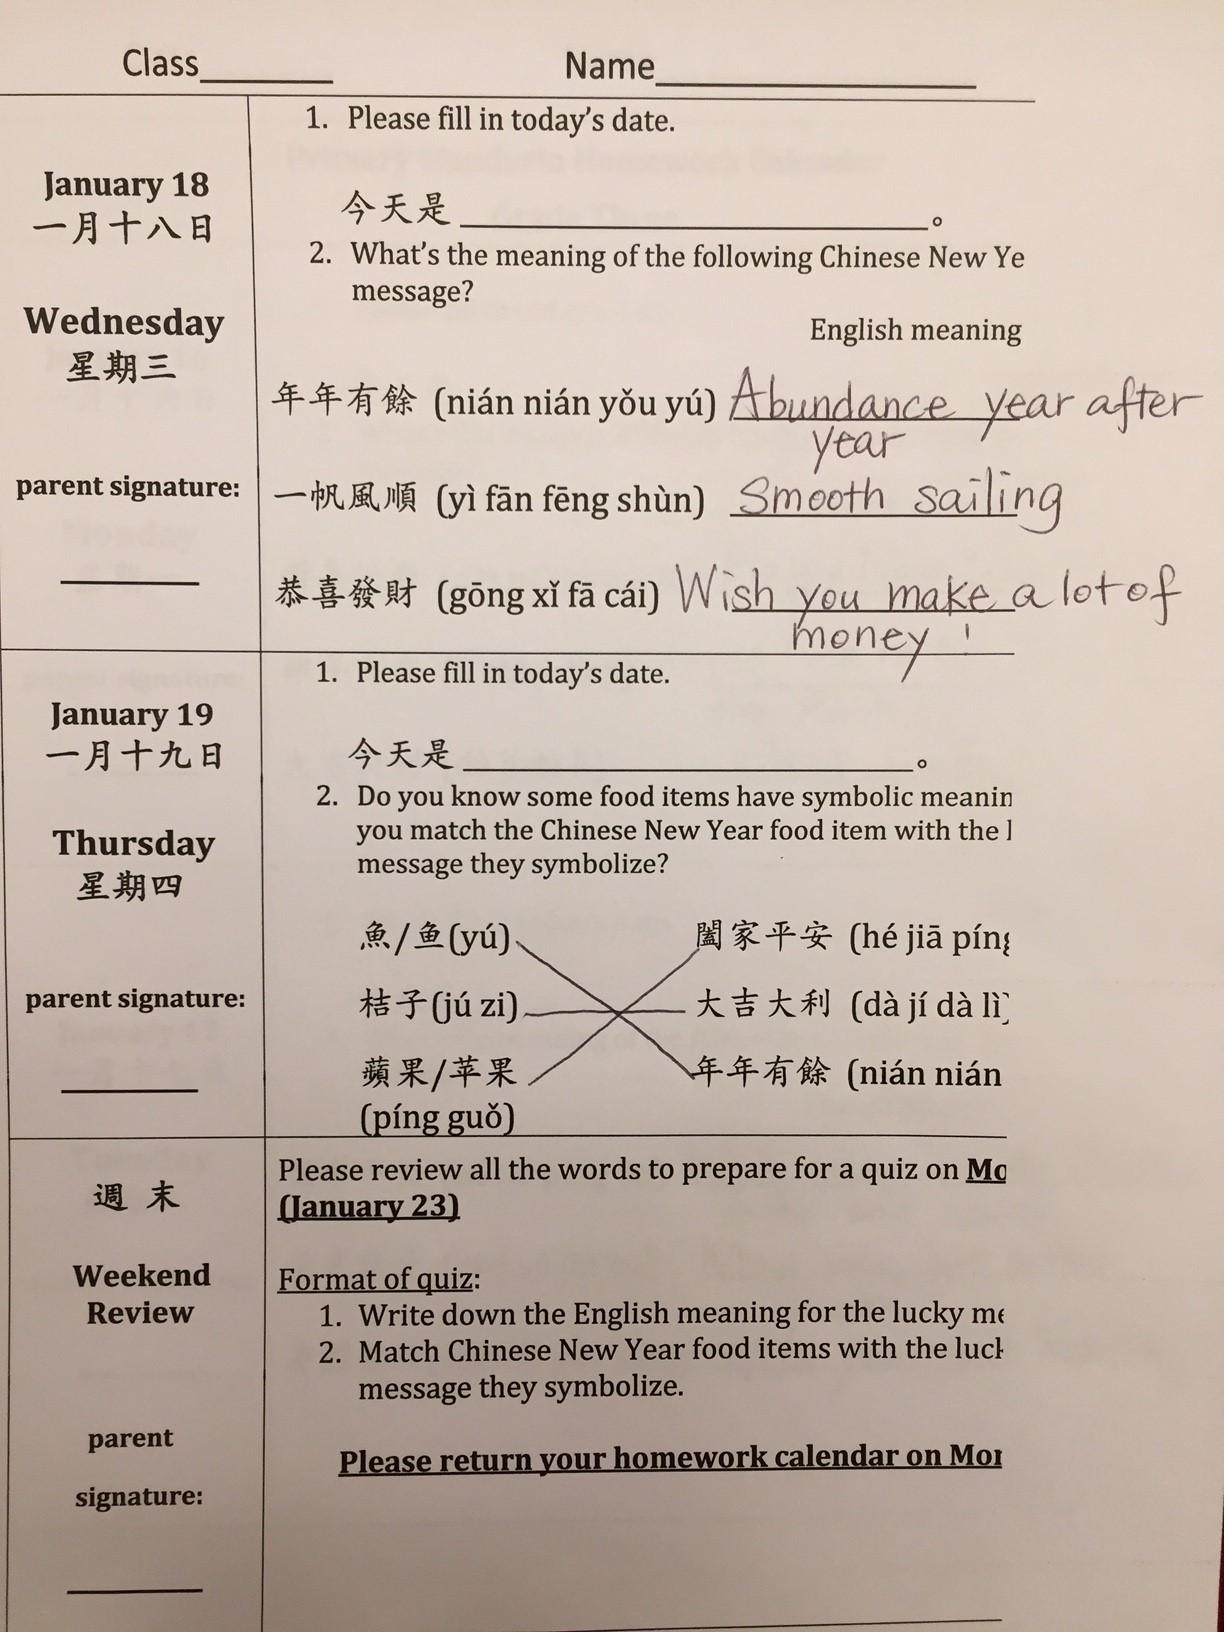 Homework Calendar-Gr3-2